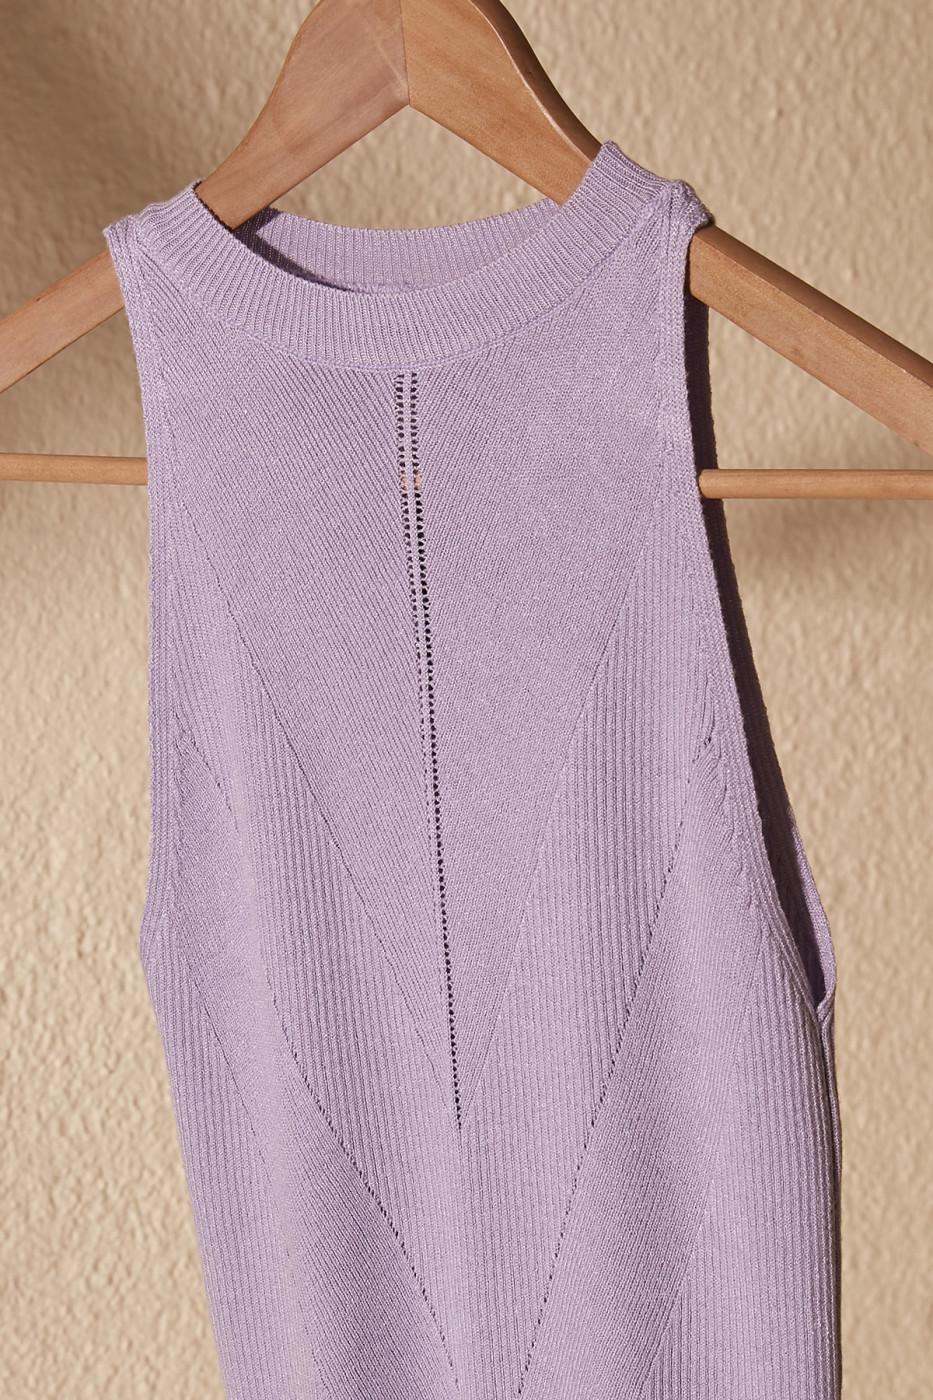 Trendyol Lila Knitted Detailed Knitwear Blouse